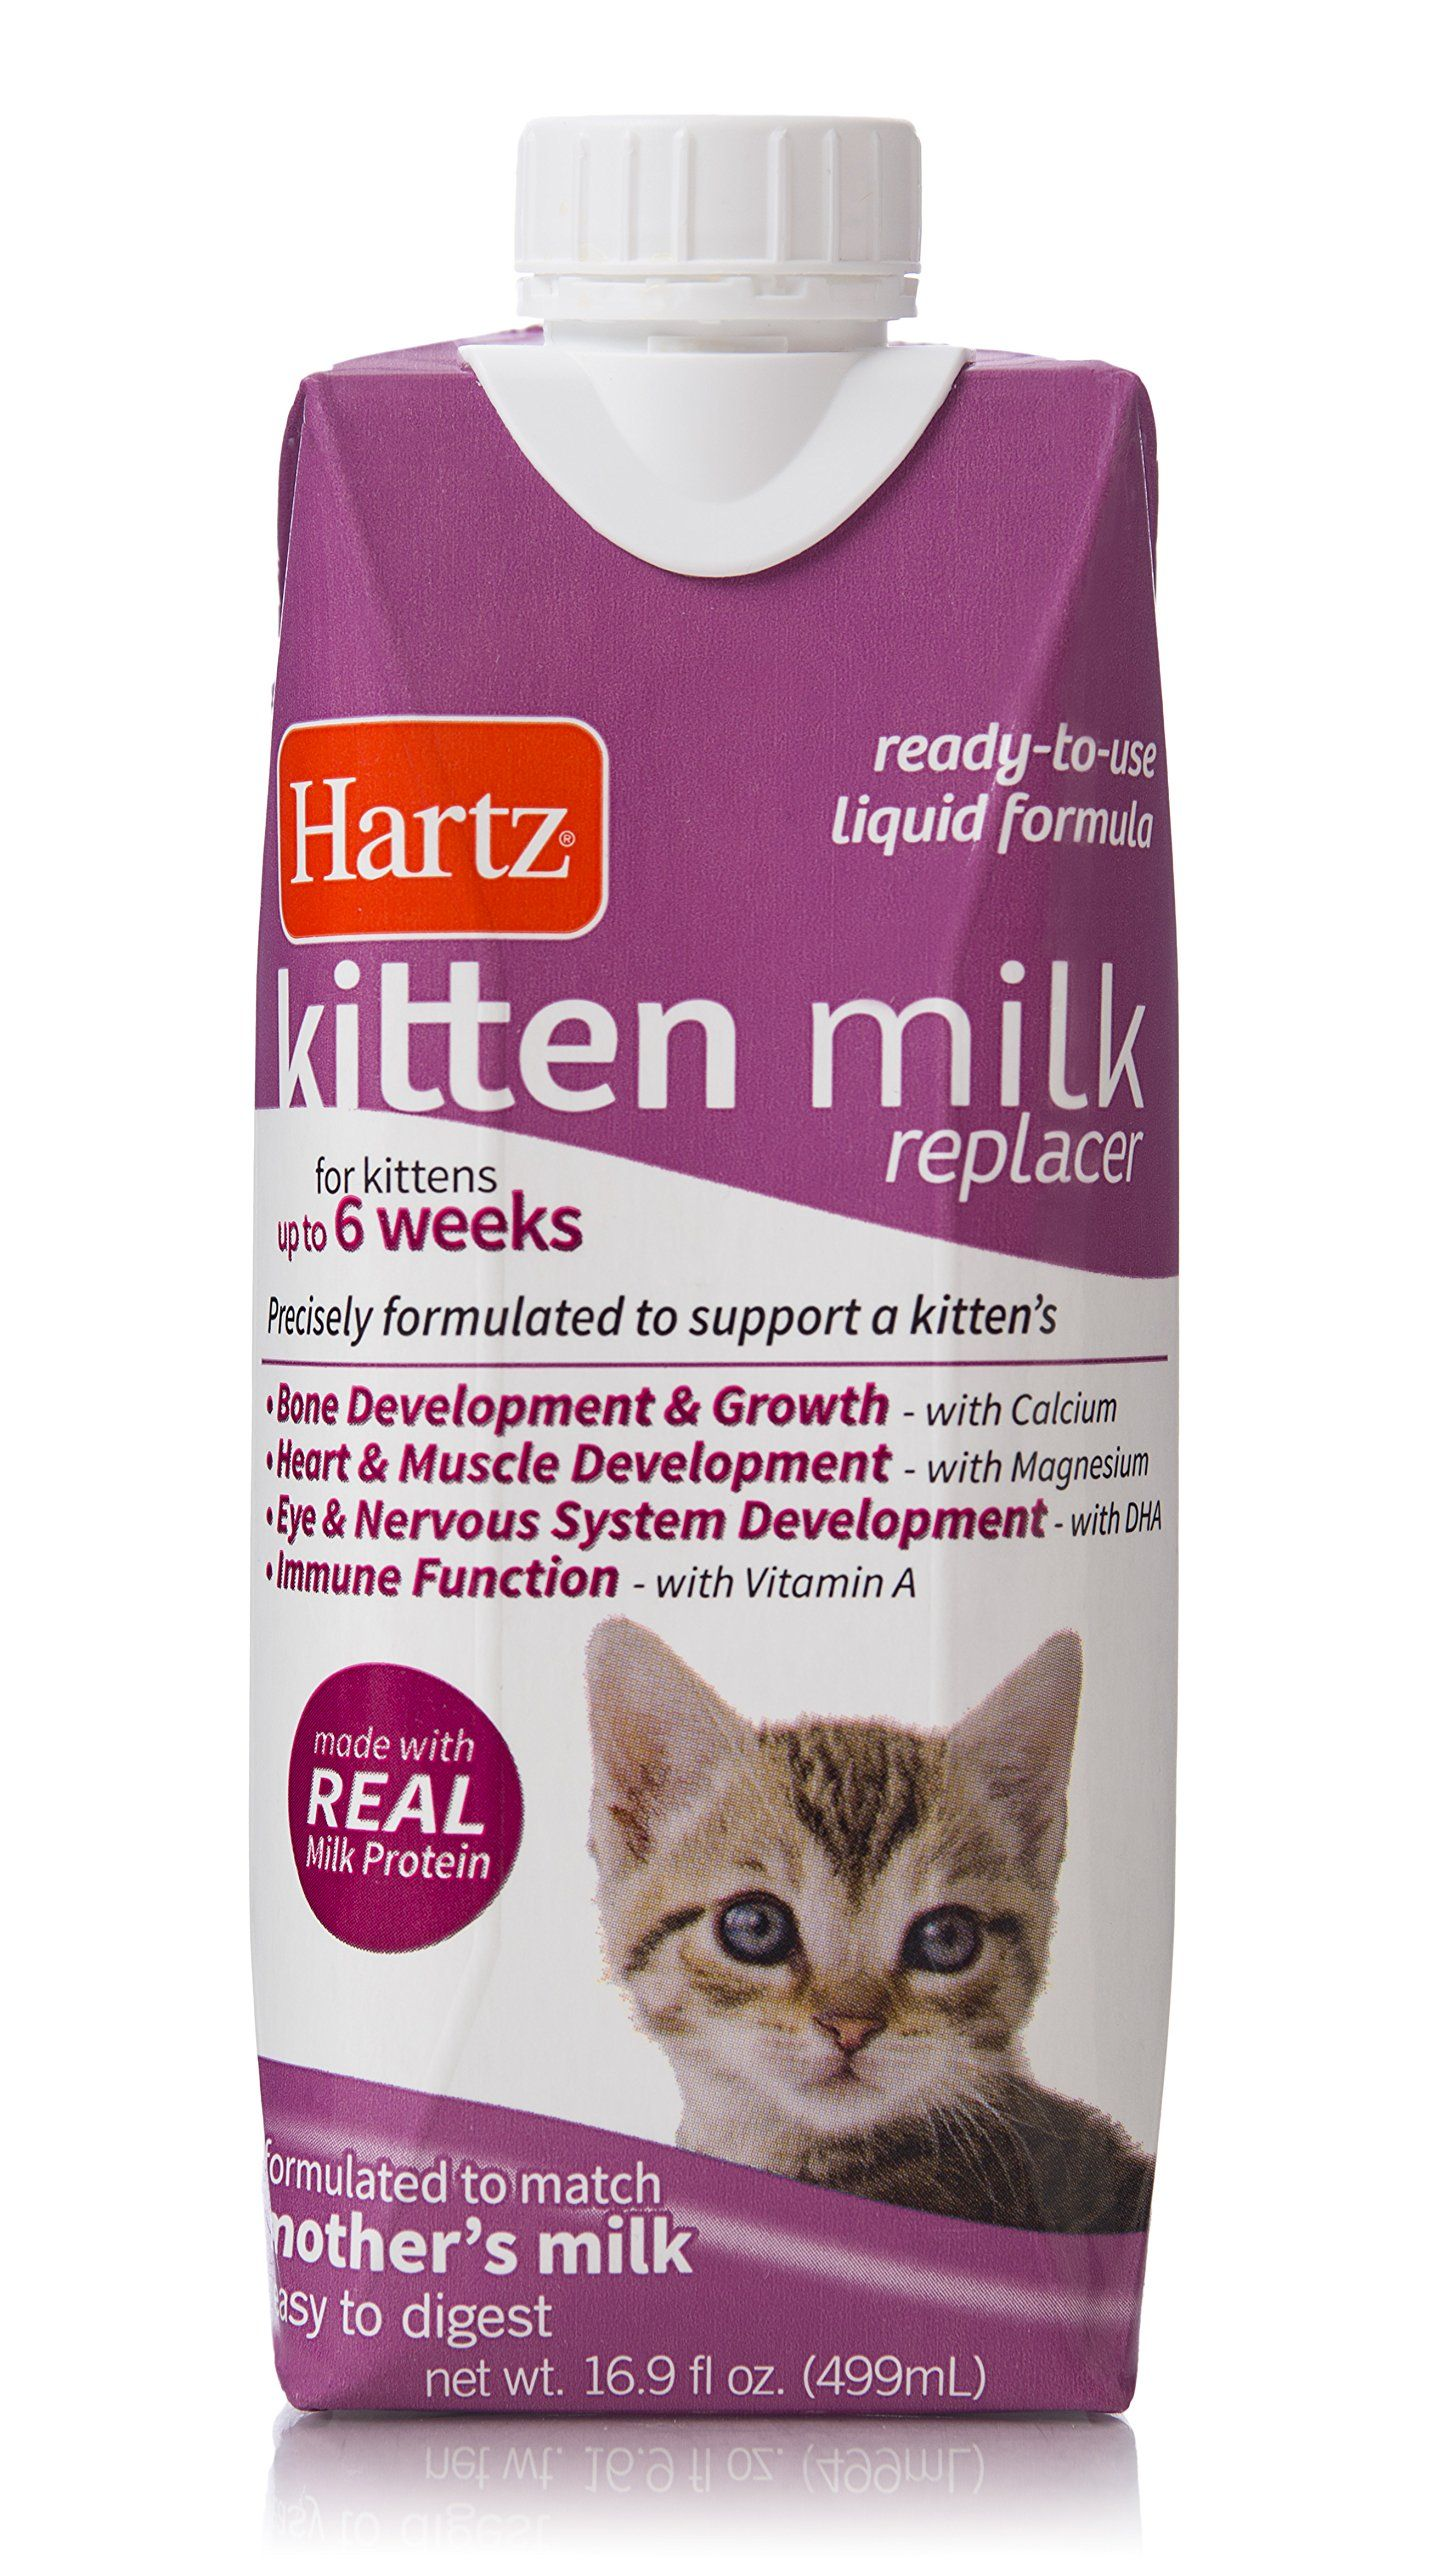 Hartz Liquid Kitten Milk Replacer Formula 16 9oz Ad Kitten Sponsored Milk Hartz Liquid Milk Protein Nutrient Cat Health